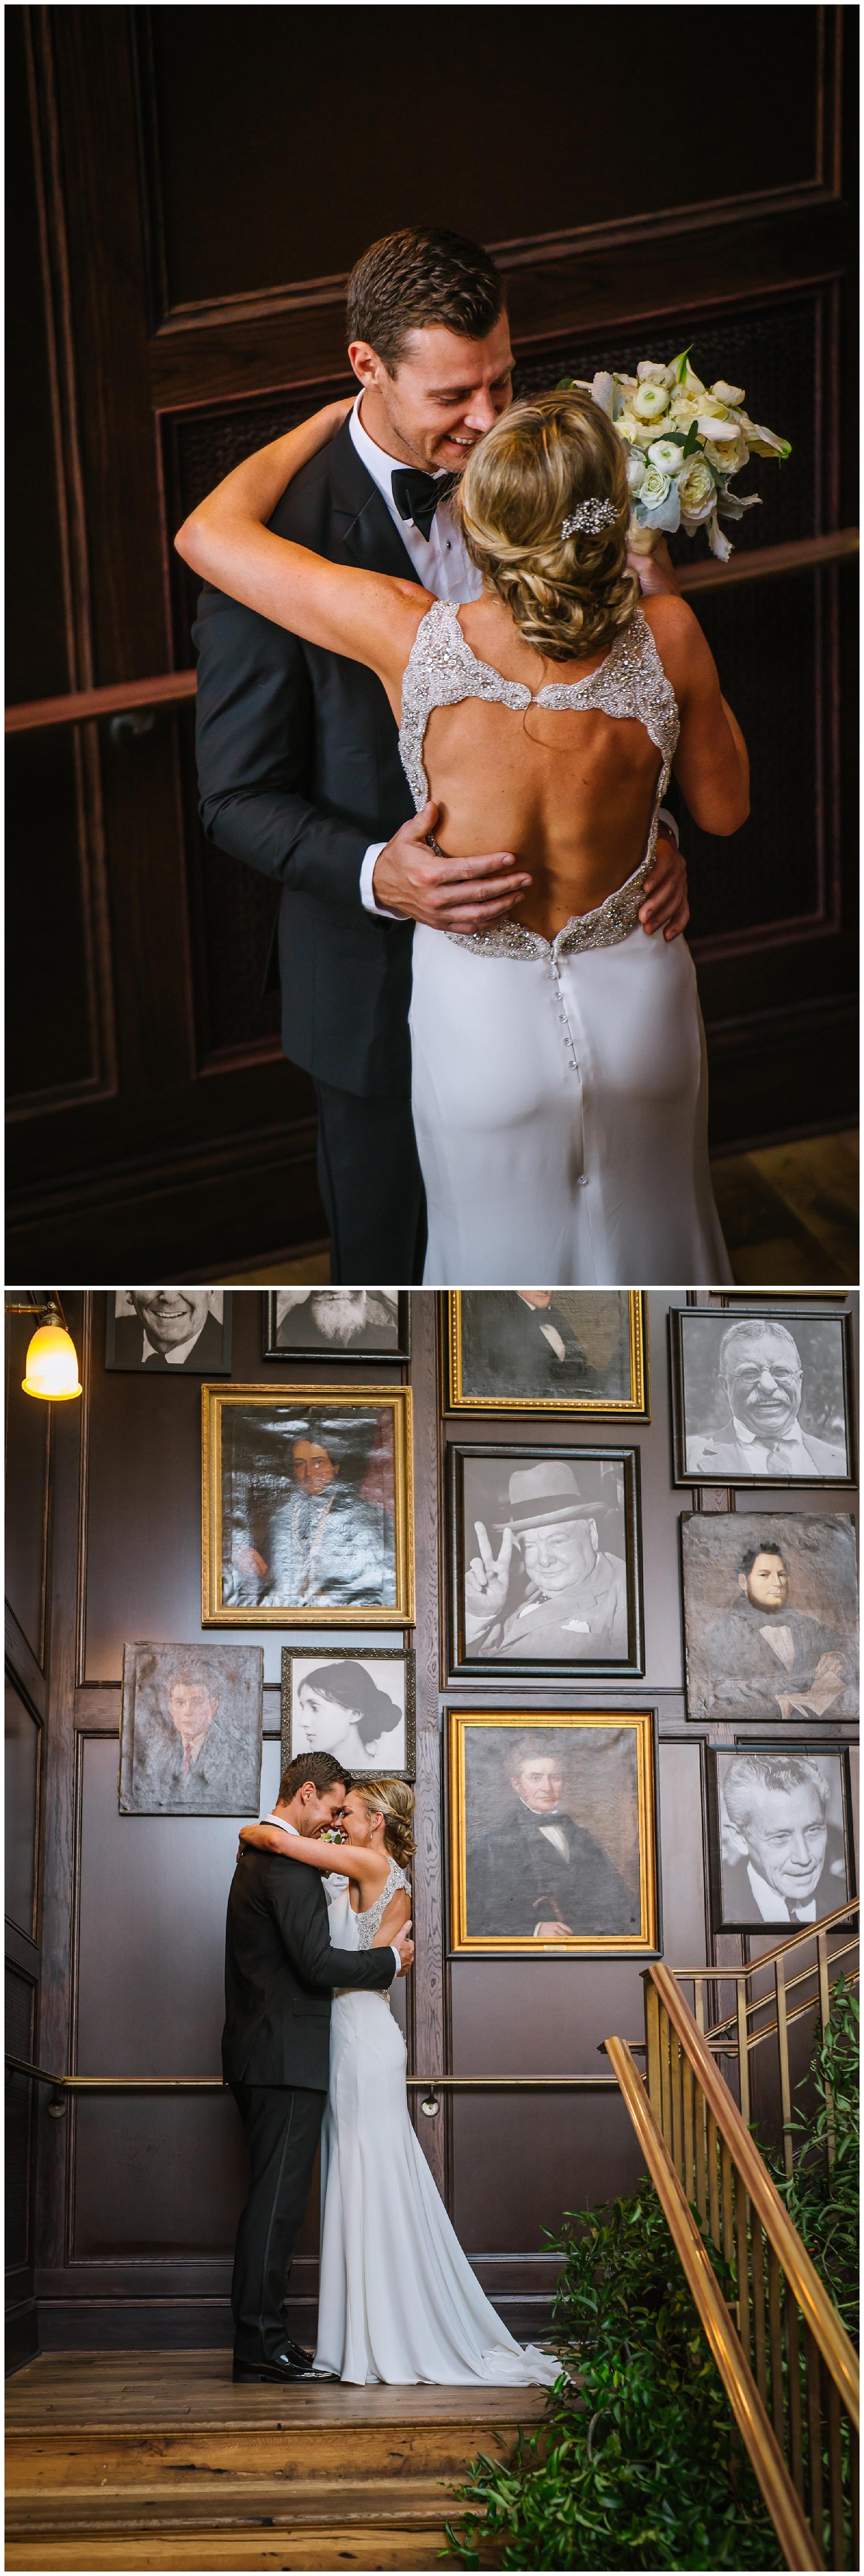 Oxford-exchange-wedding-photogapher-garland-candels-bookstore-burgandy-botanica_0027.jpg